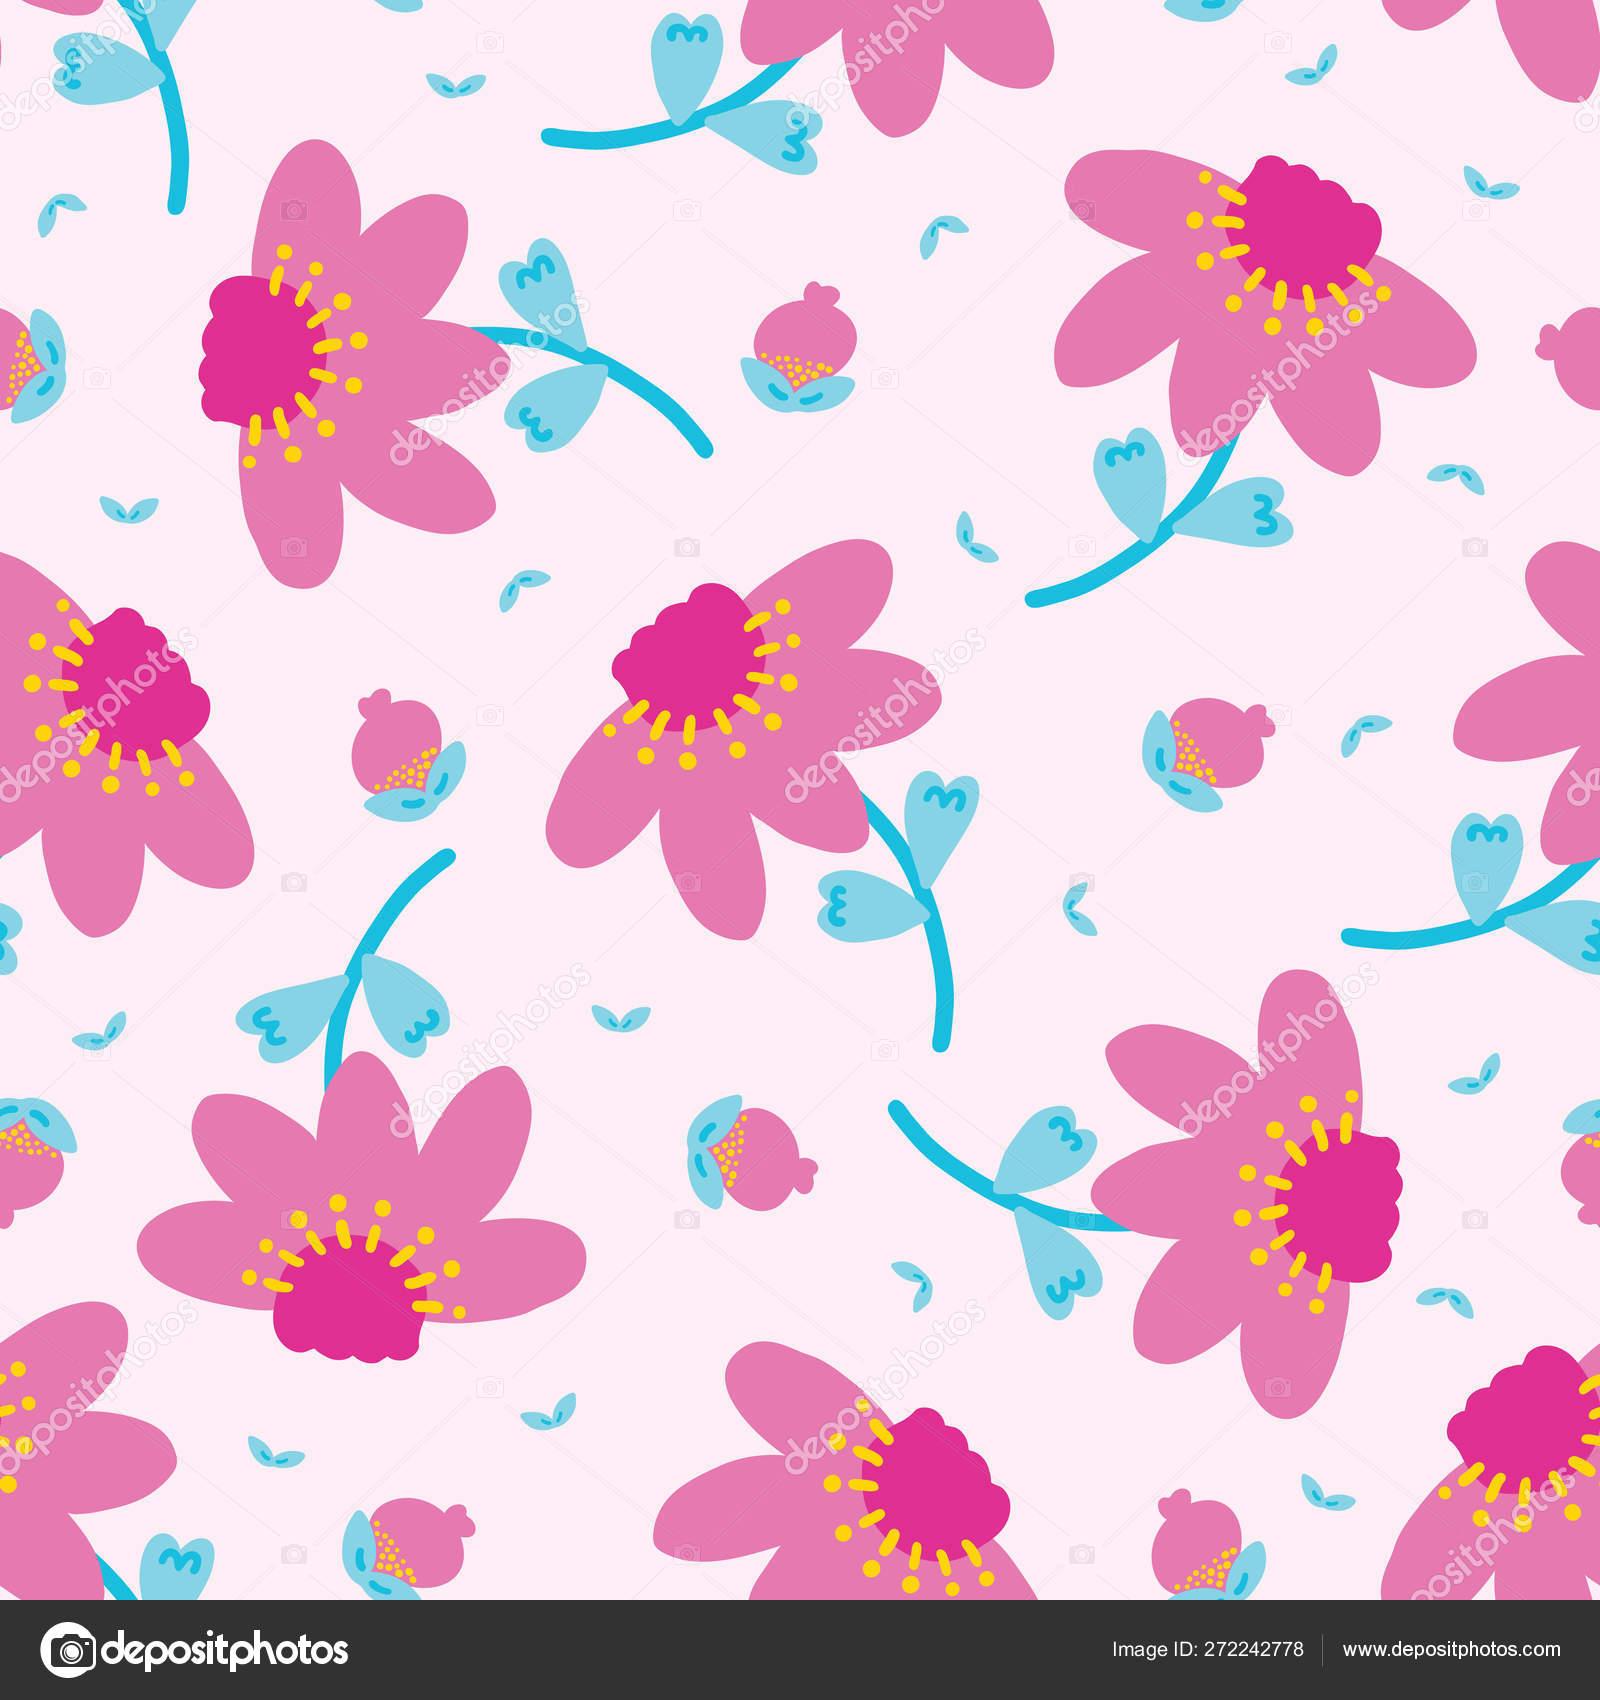 8caa58f4e168d Bright summer daisy flower bloom seamless pattern. Stylized retro ...